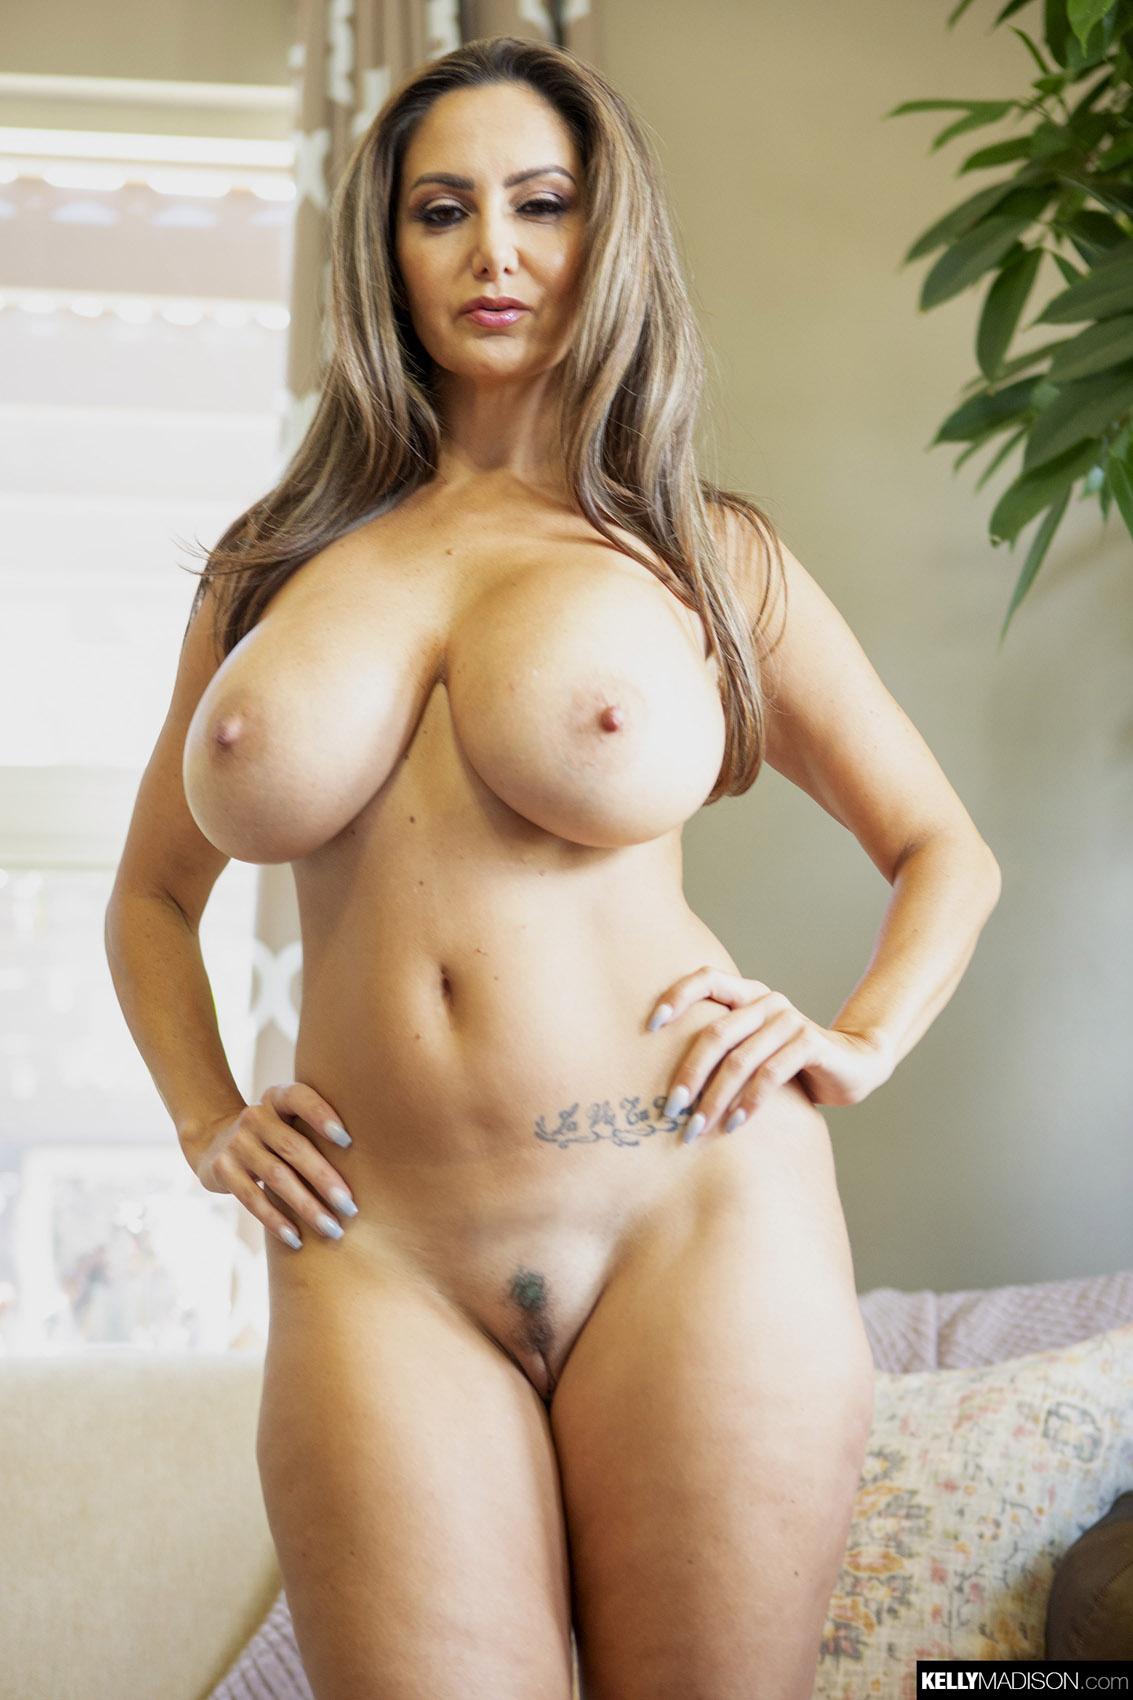 Ava addams naked pics